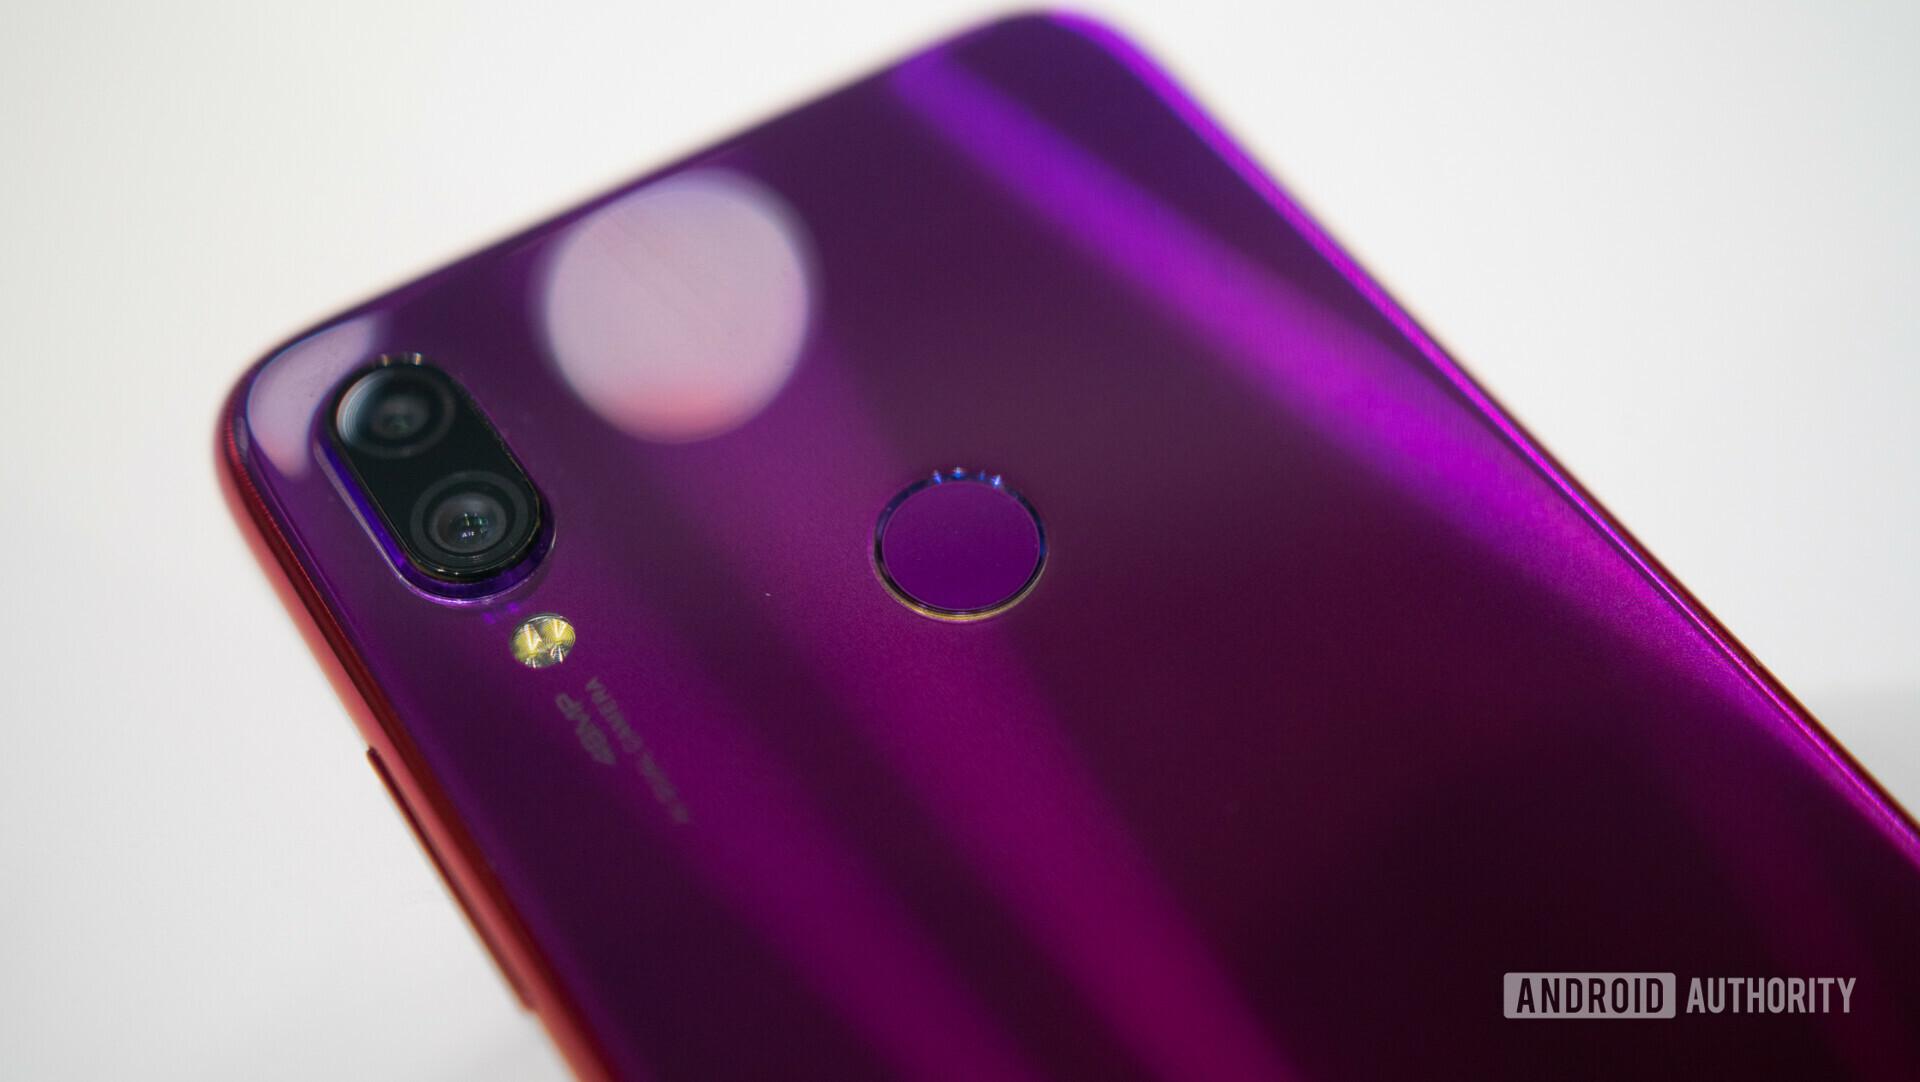 Backside photo of the Xiaomi redmi Note 7 focusing on the dual cameras and fingerprint sensor.